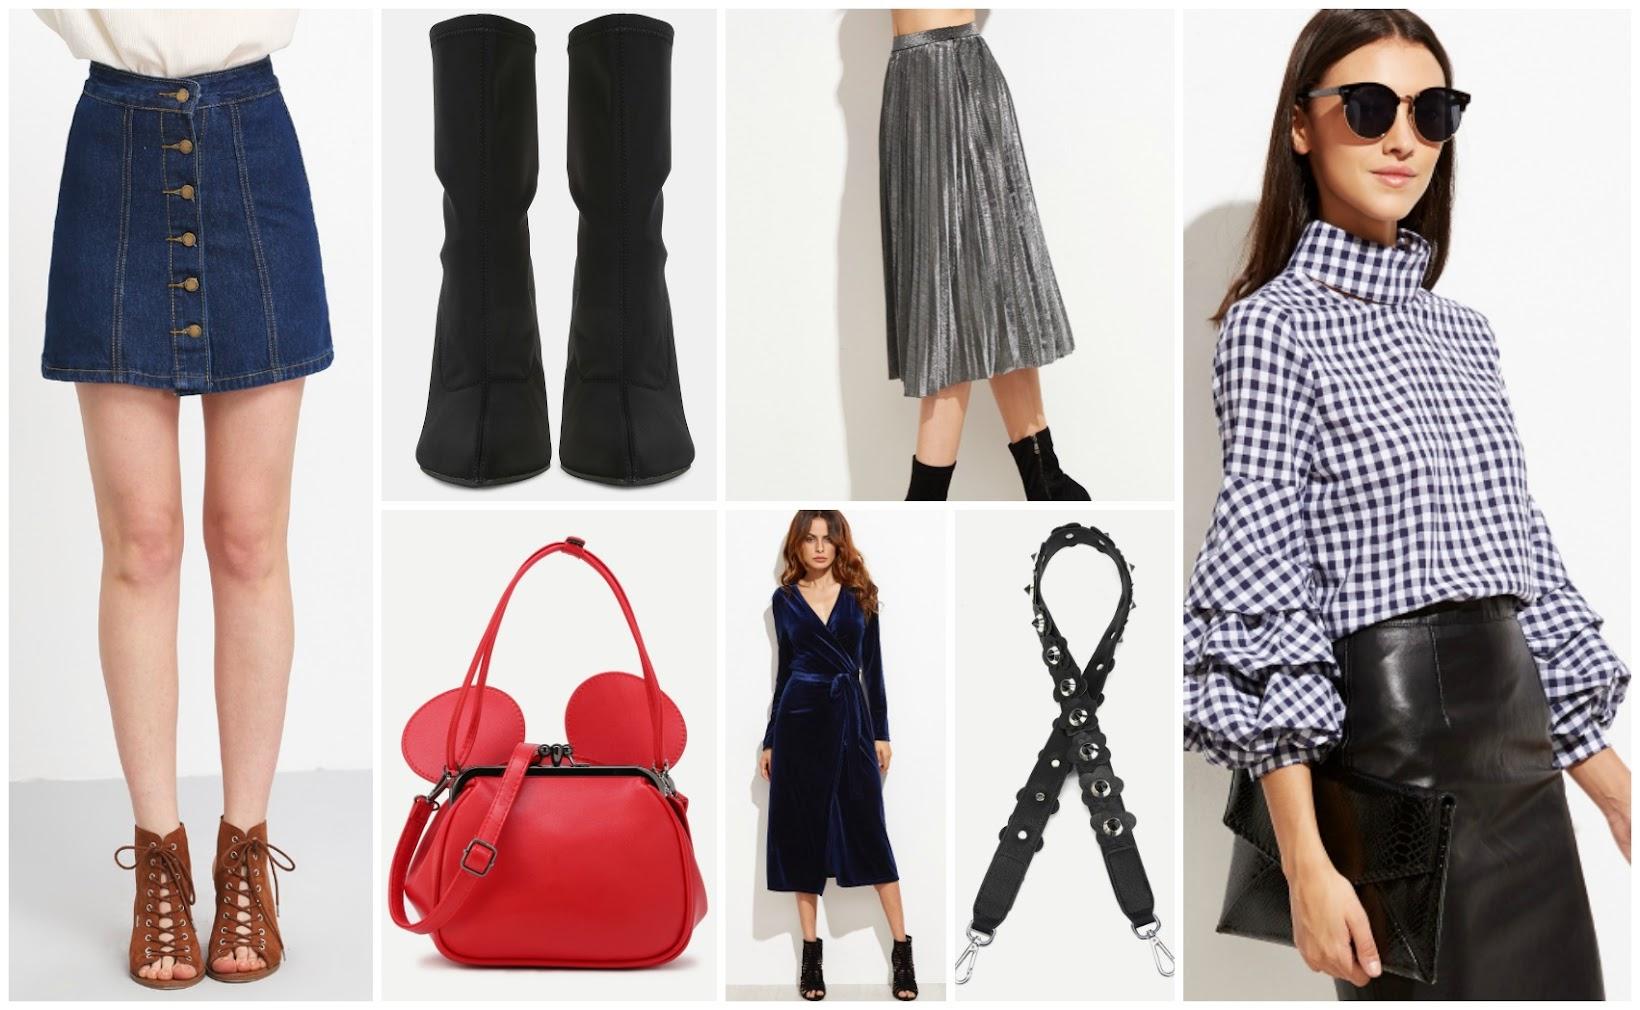 a05cf98c4371 SheIn Fall Faves | Fashionlingual